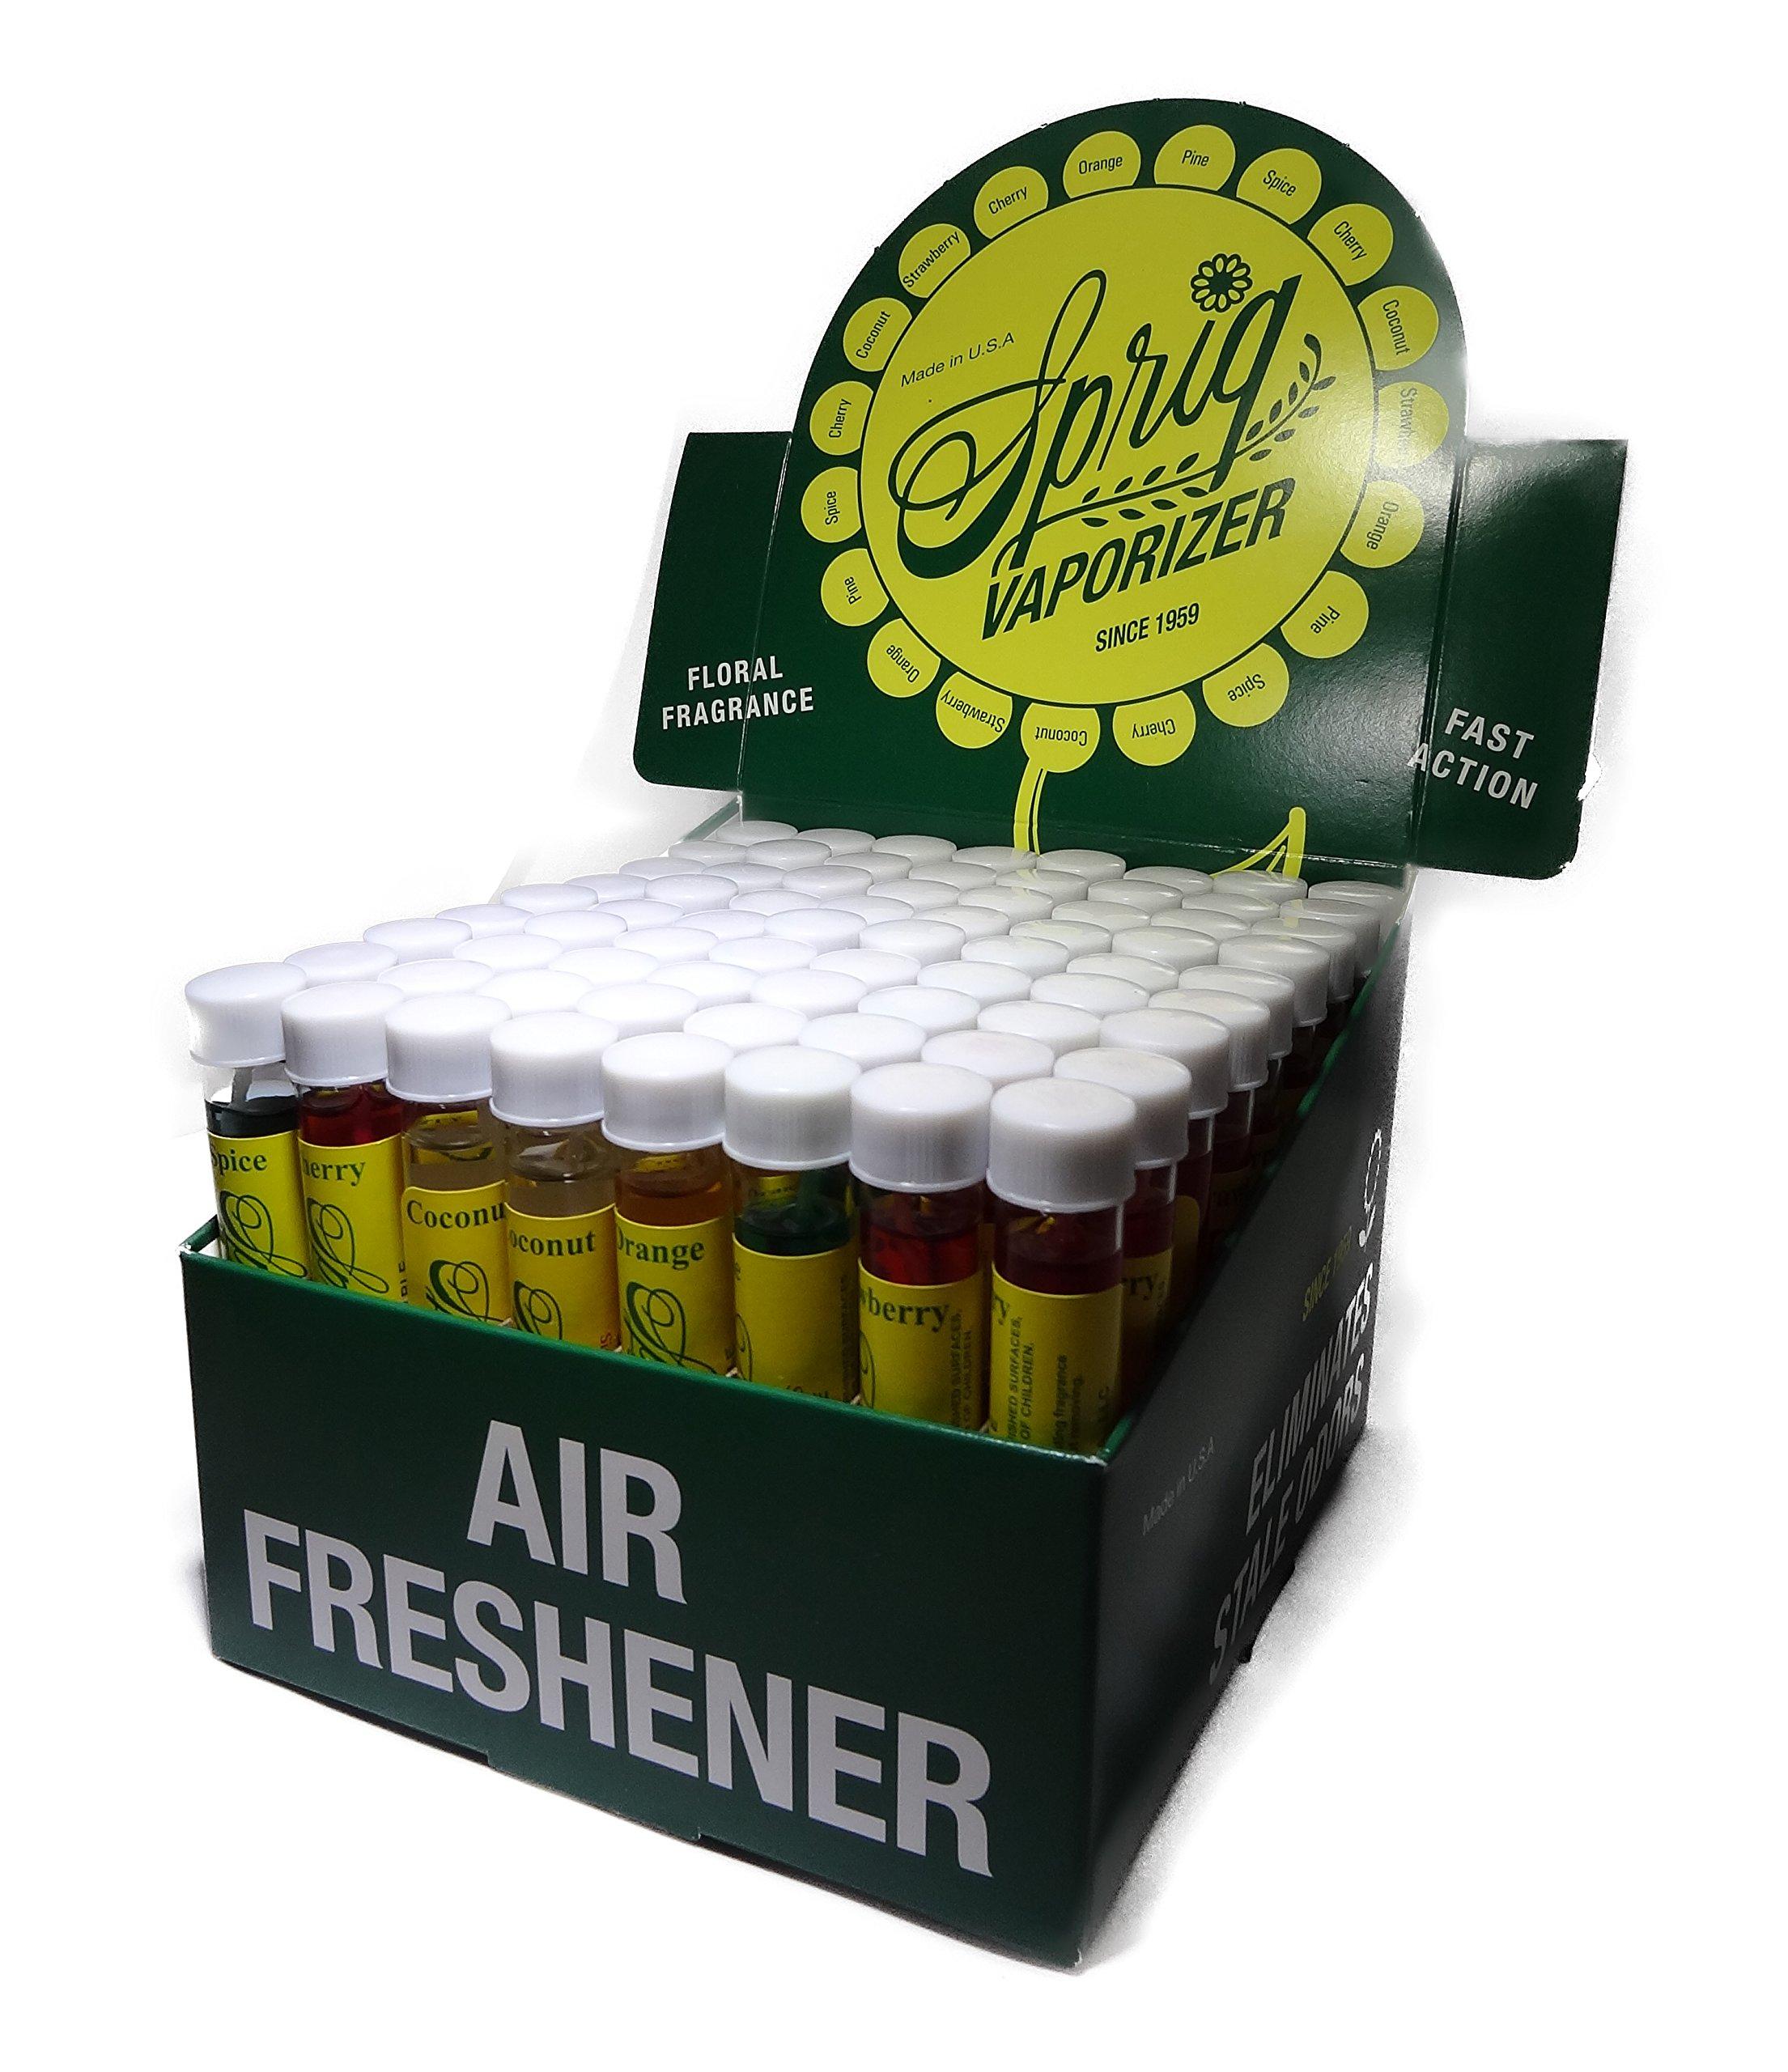 Sprig Vaporizer Air Freshener Assorted 72pc pack